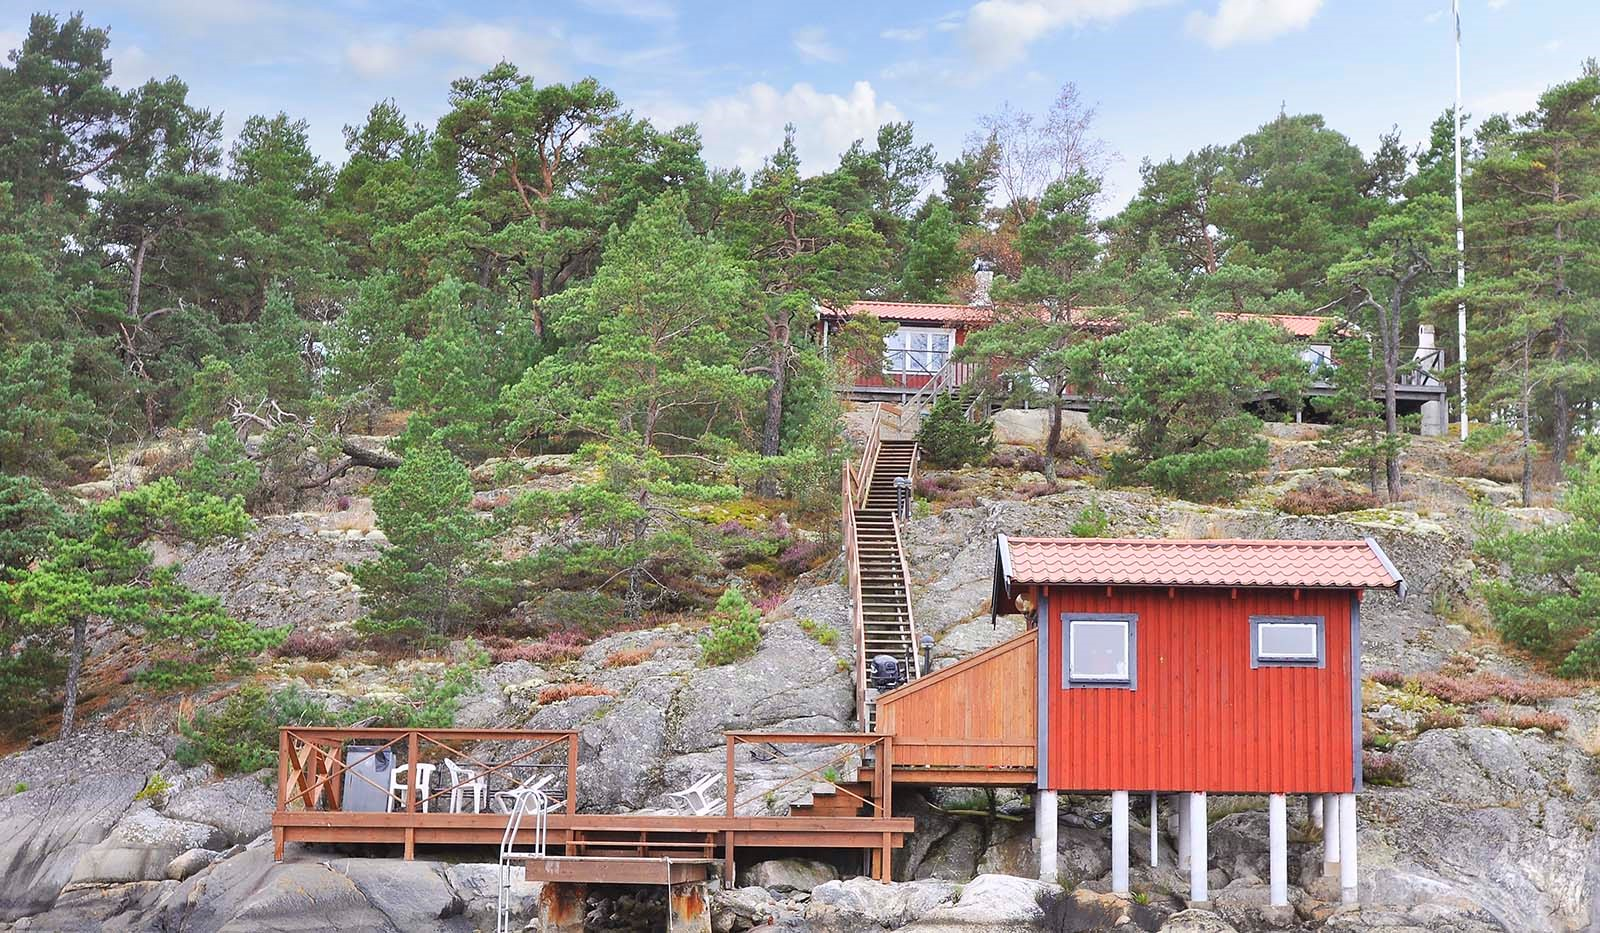 Smådalarö/ Kalvholmen/Gränö - Sjötomt